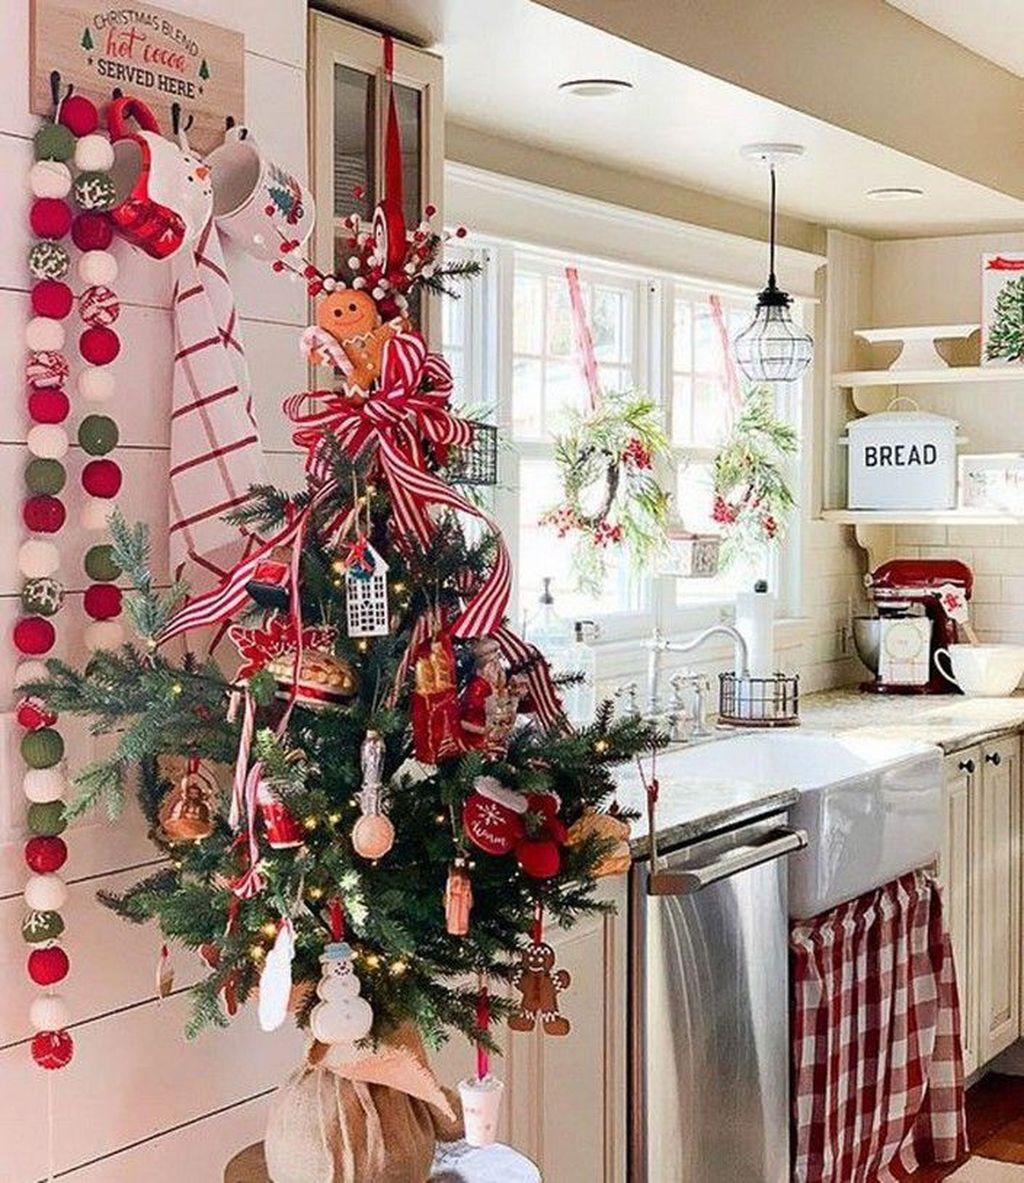 addobbi-natalizi-cucina-29